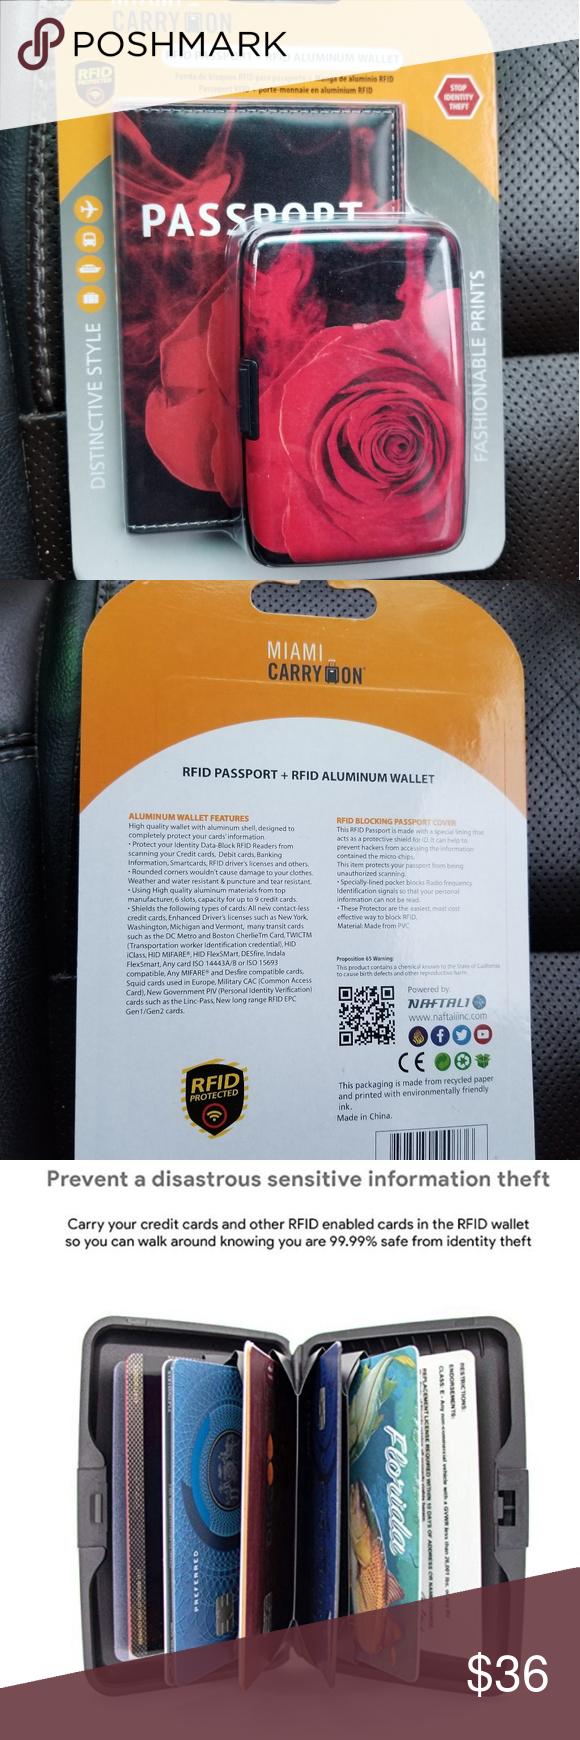 Holiday Travel RFID Passport + RFID Wallet Set (BRAND NEW